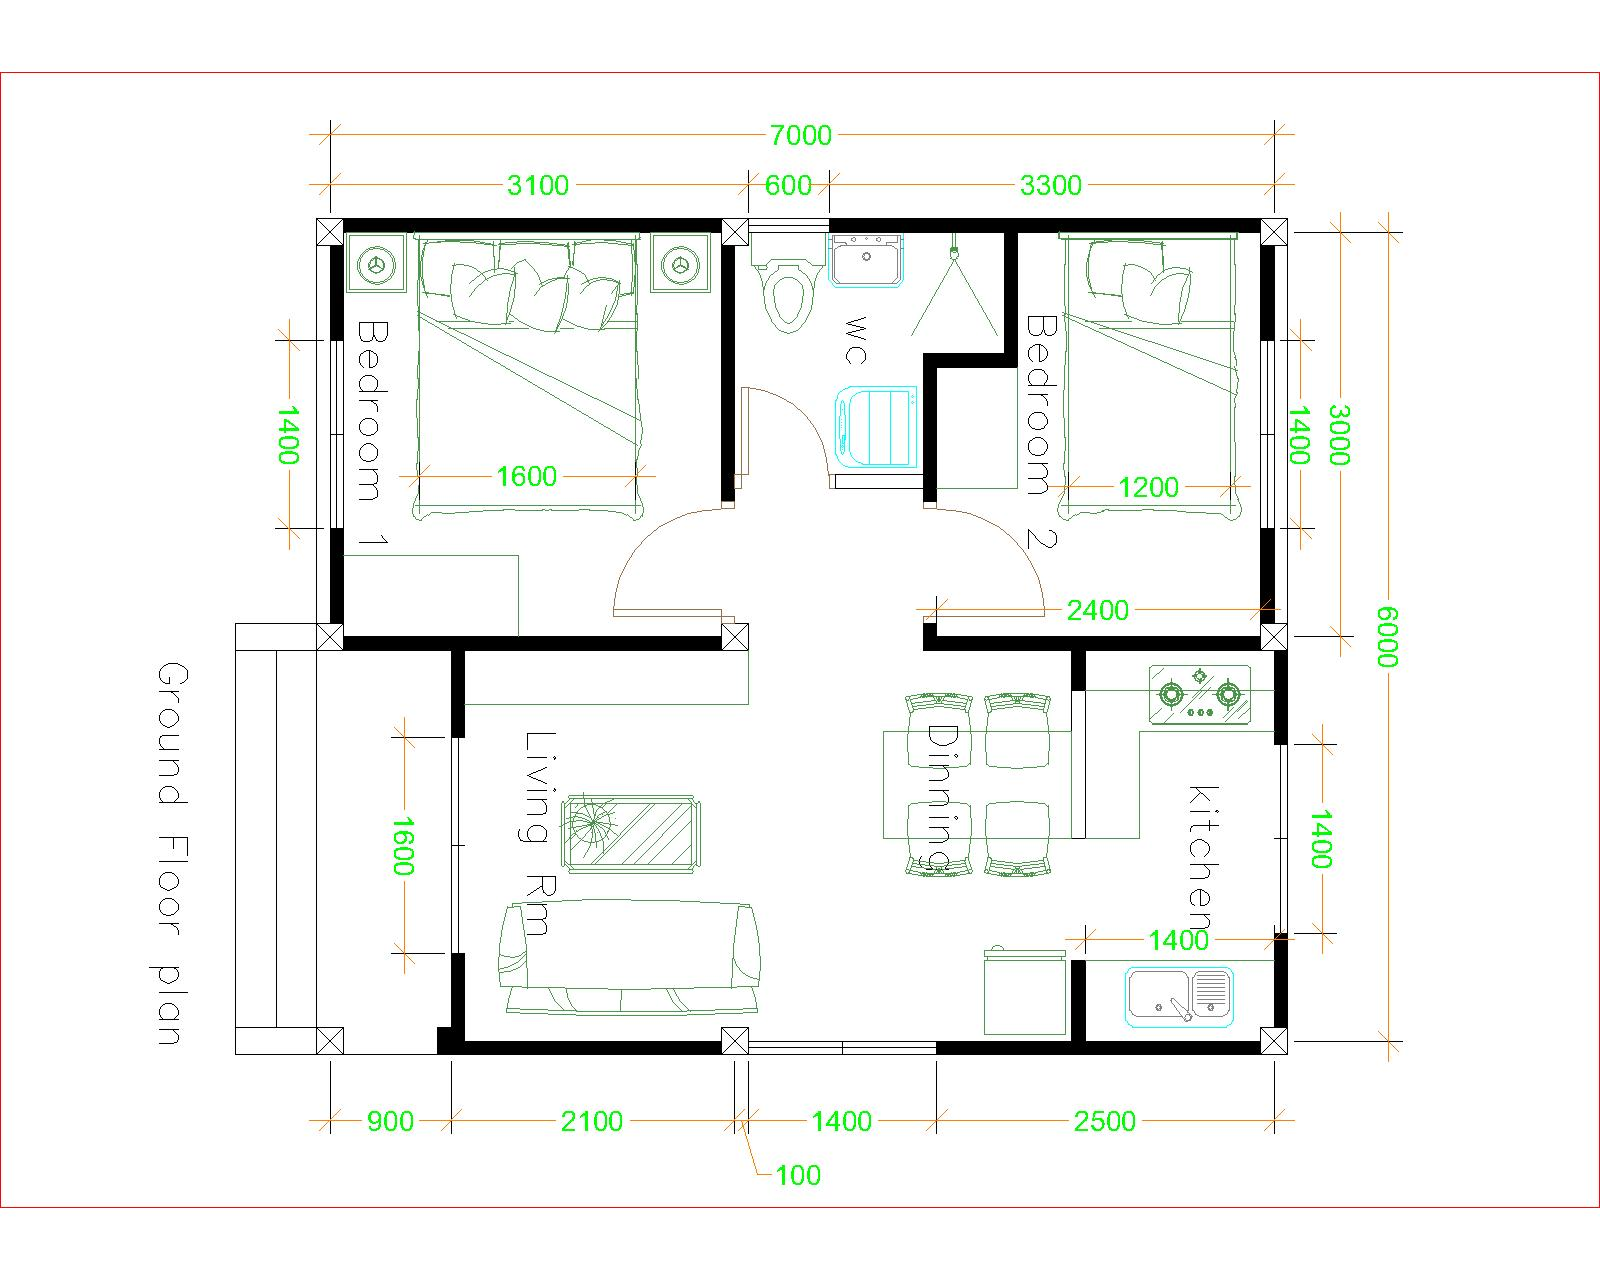 Tiny House Layout 6x7 Meter 20x23 Feet 2 Beds floor plan